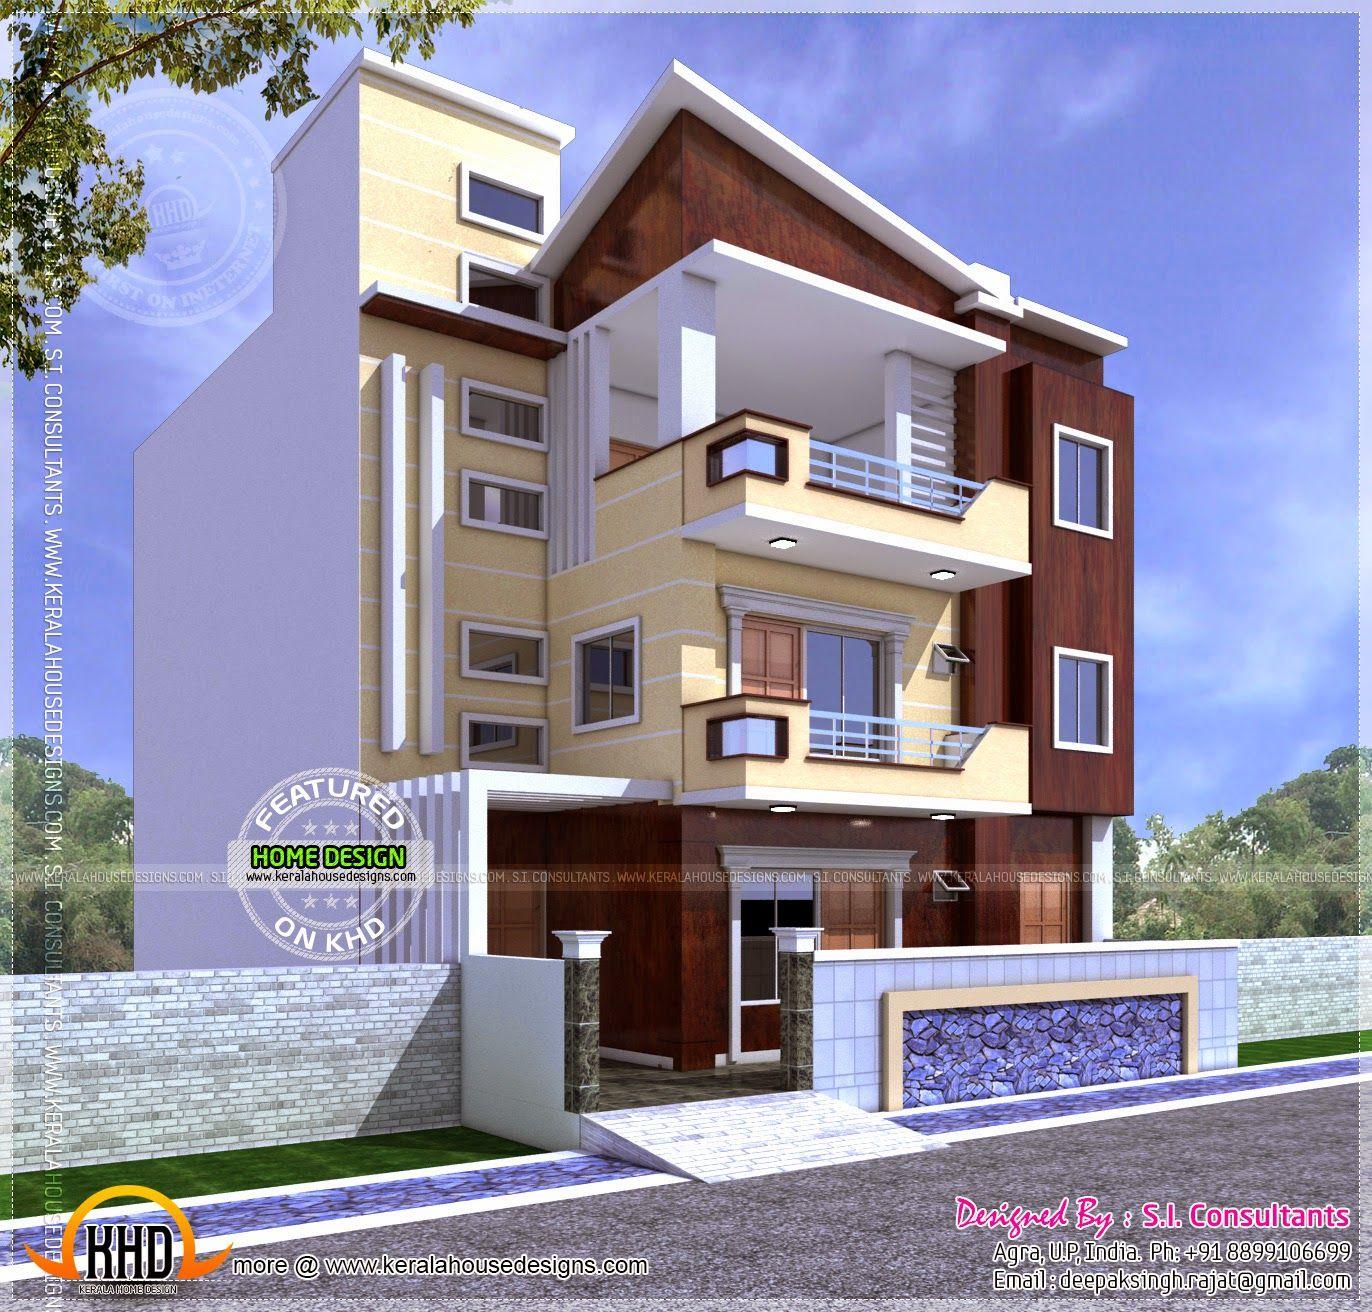 Three storied house jpg jpeg image 1372 x 1312 pixels